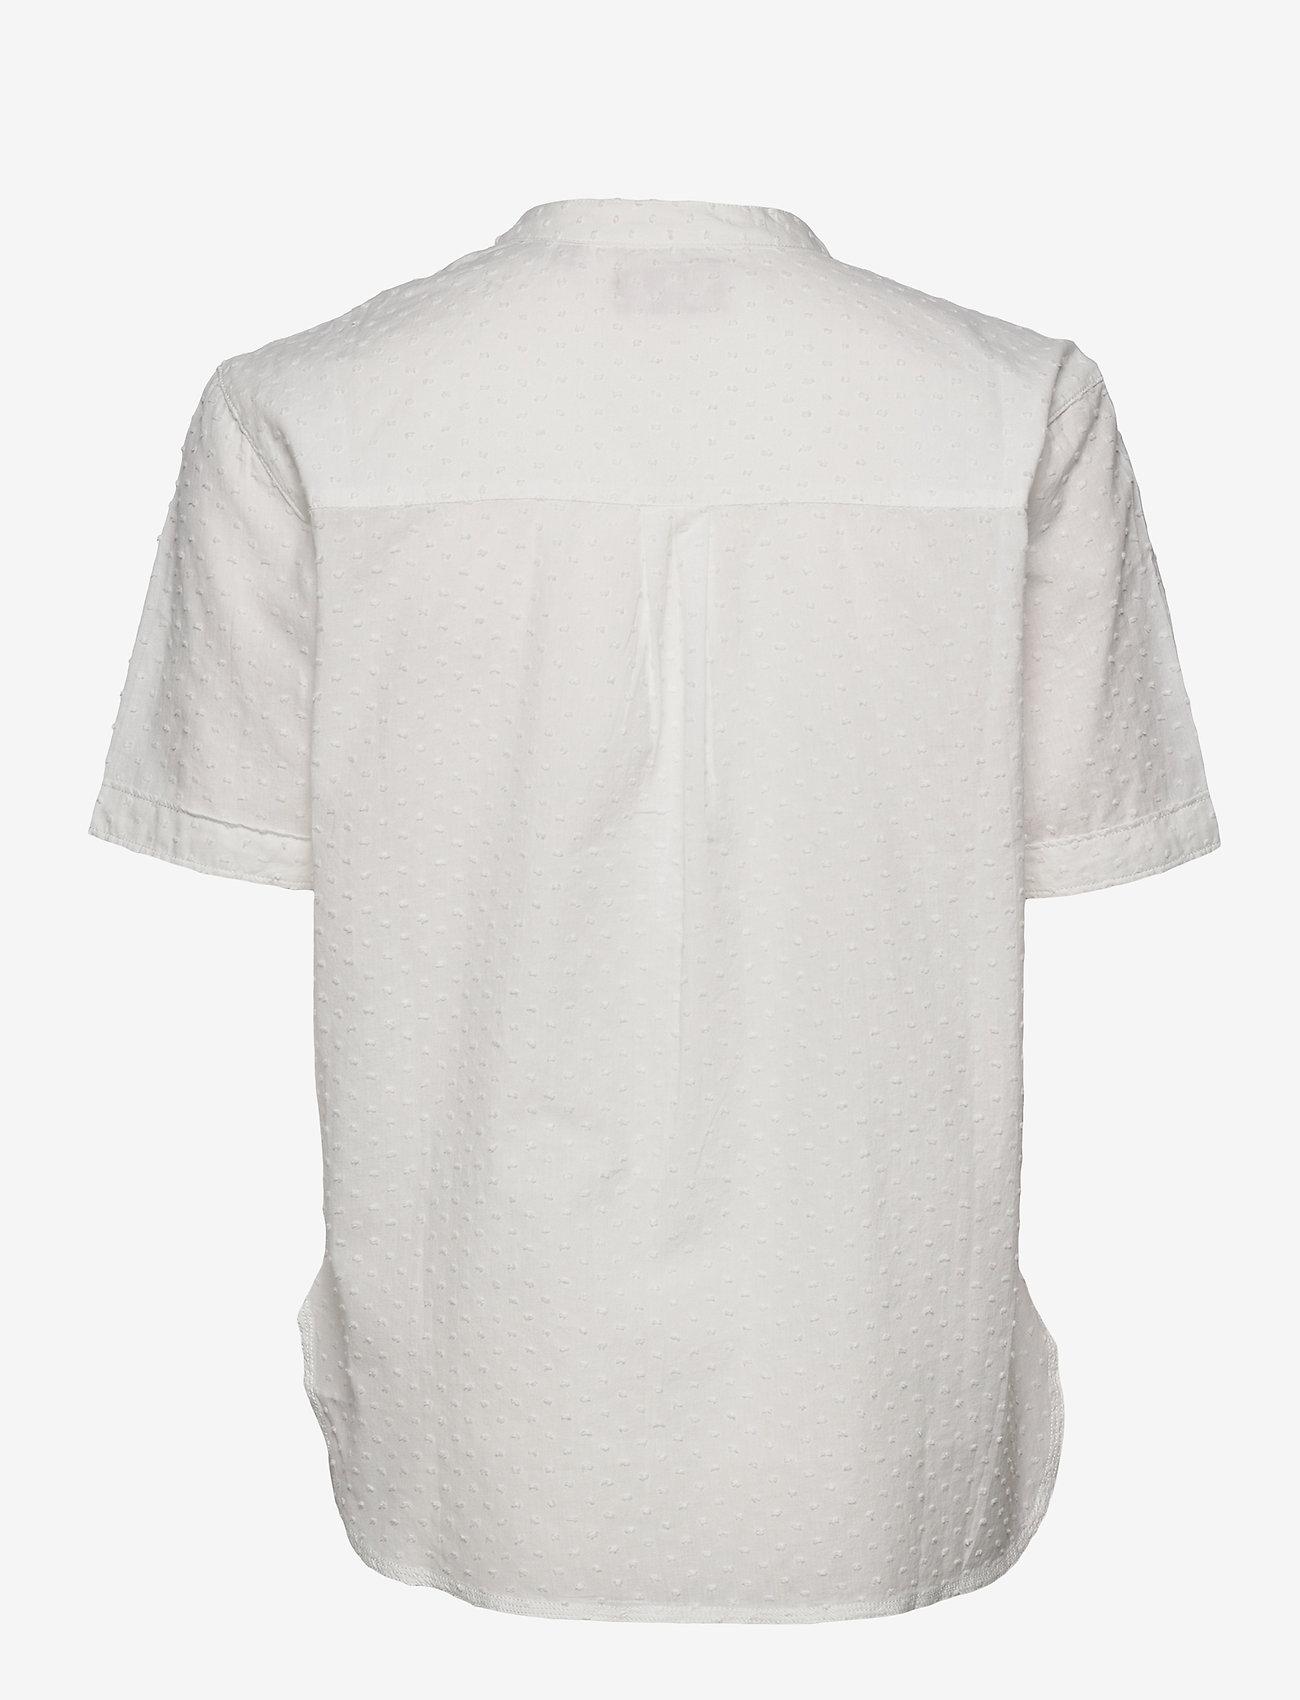 Superdry - GRANDAD BLOUSE - short-sleeved blouses - off white - 1